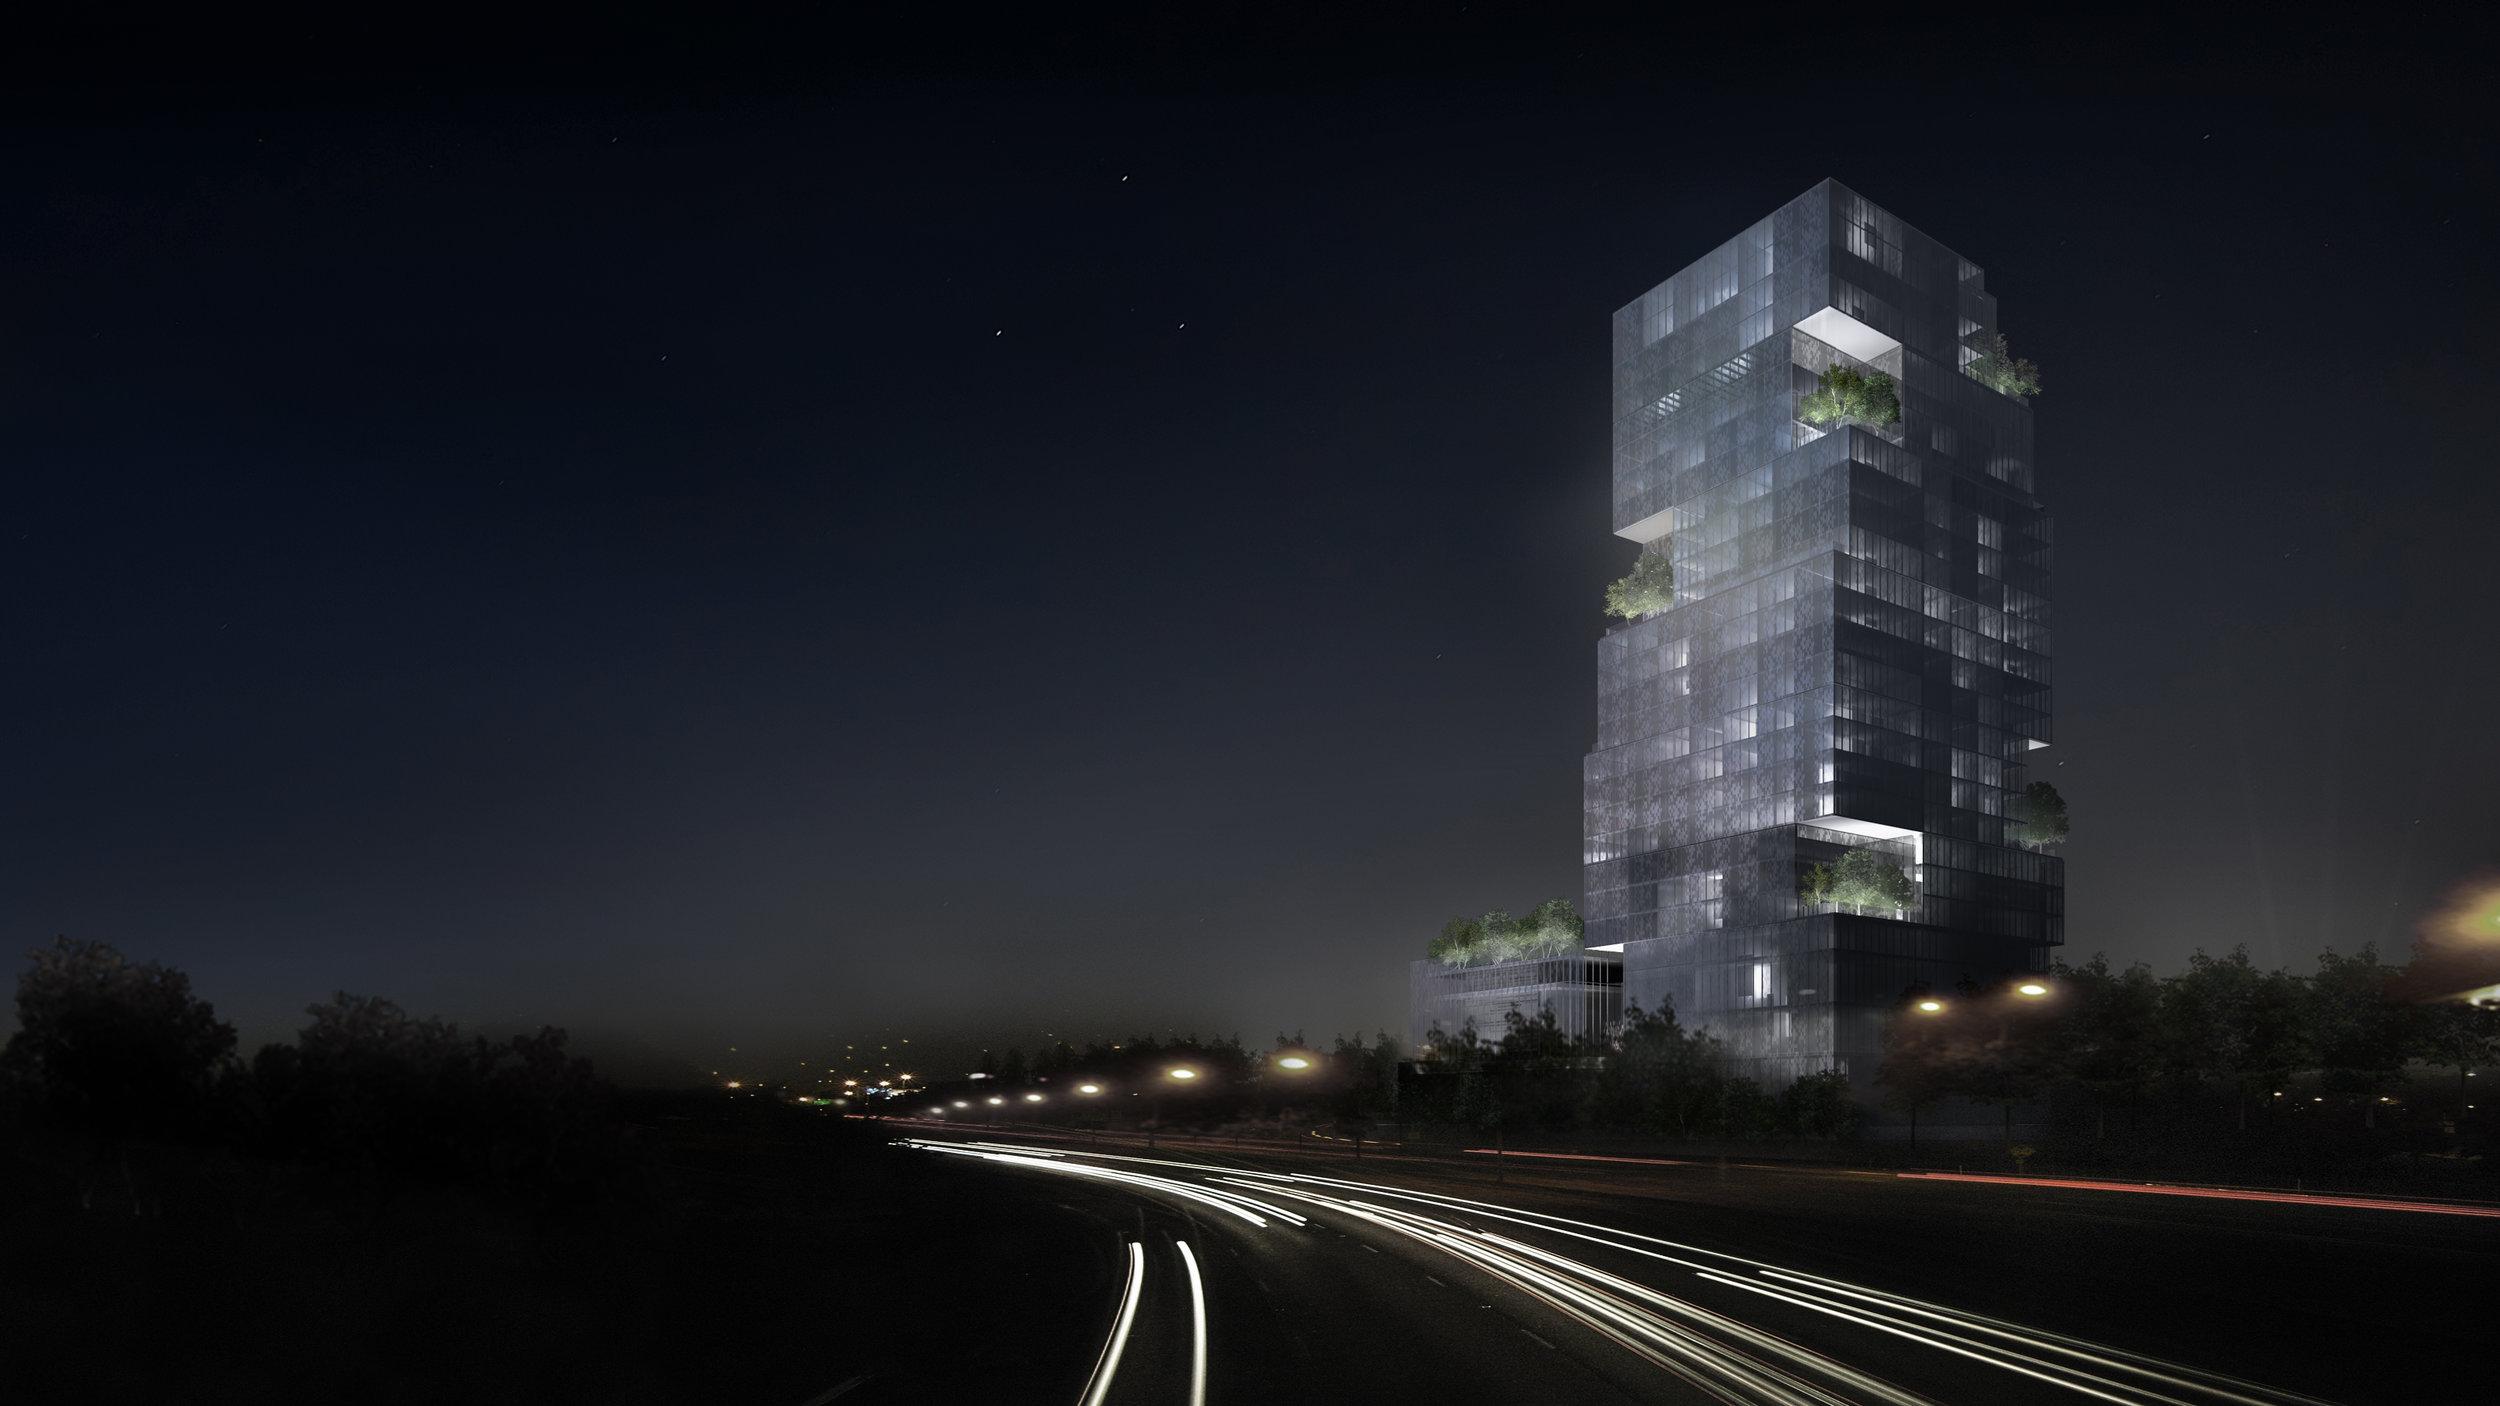 CNE Hotel - Night View from Gardiner Expressway